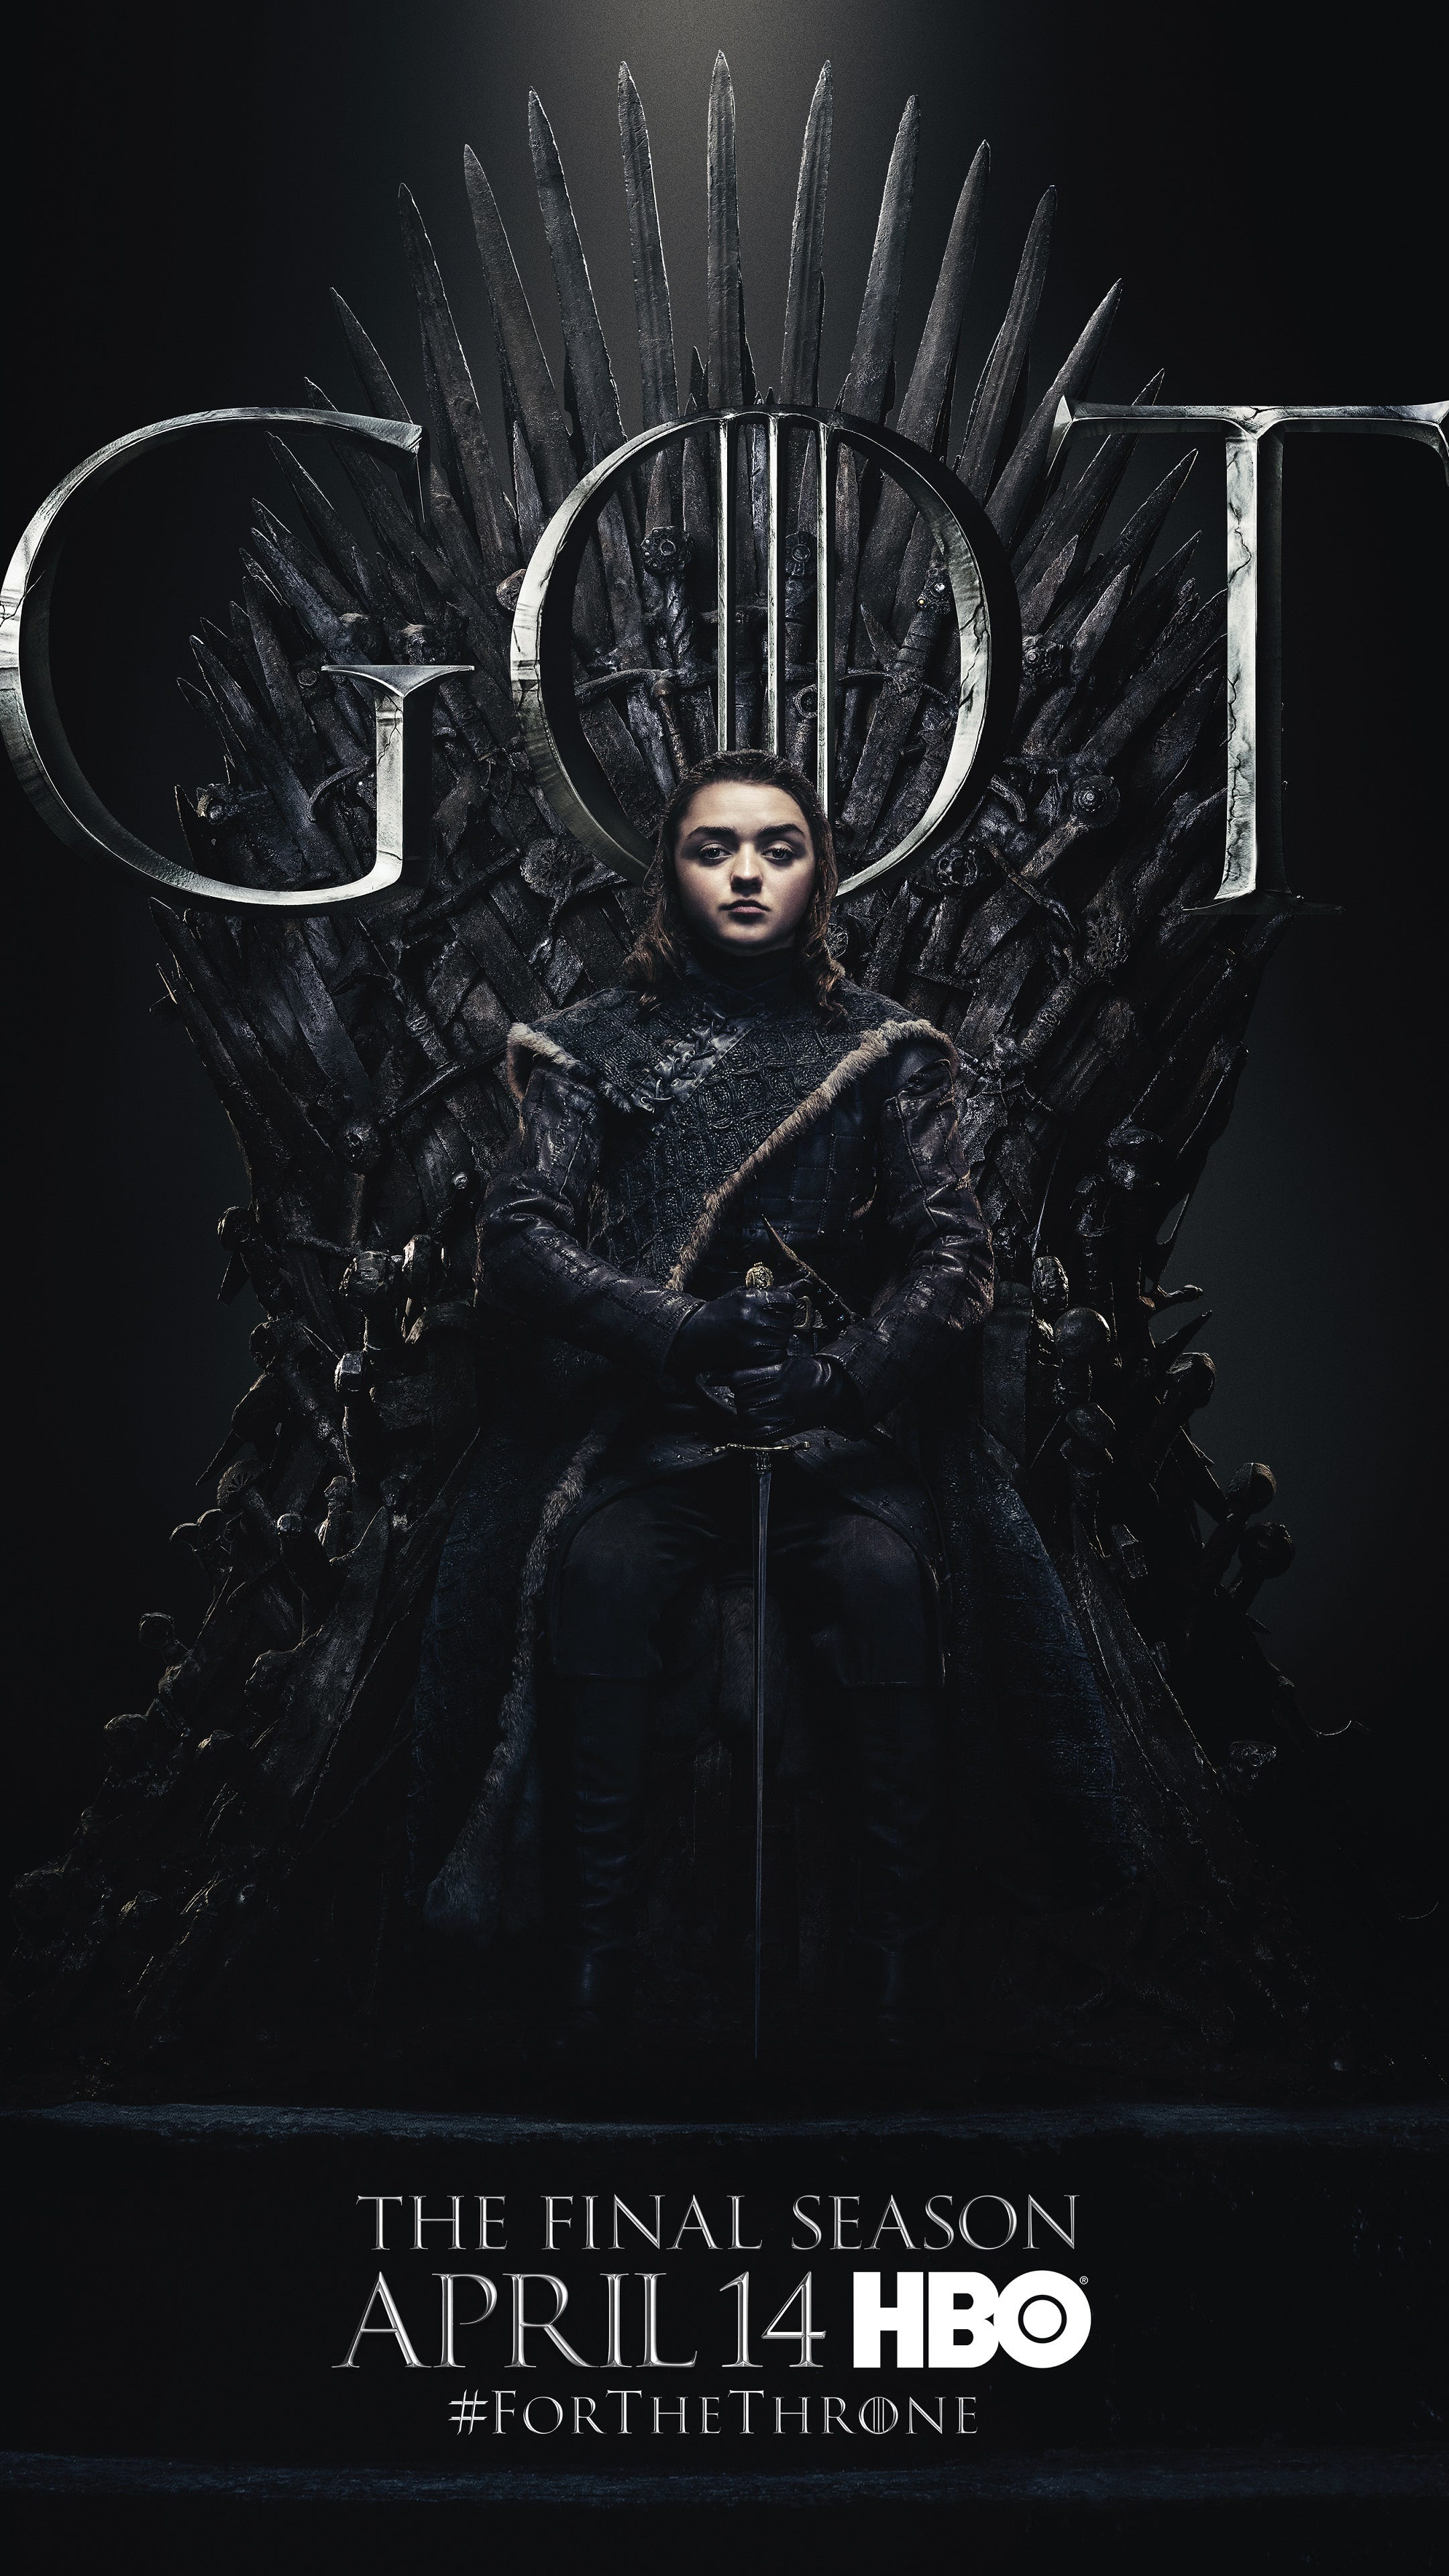 GAME OF THRONES TV Show PHOTO Print POSTER Daenerys Targaryen Emilia Clarke 002